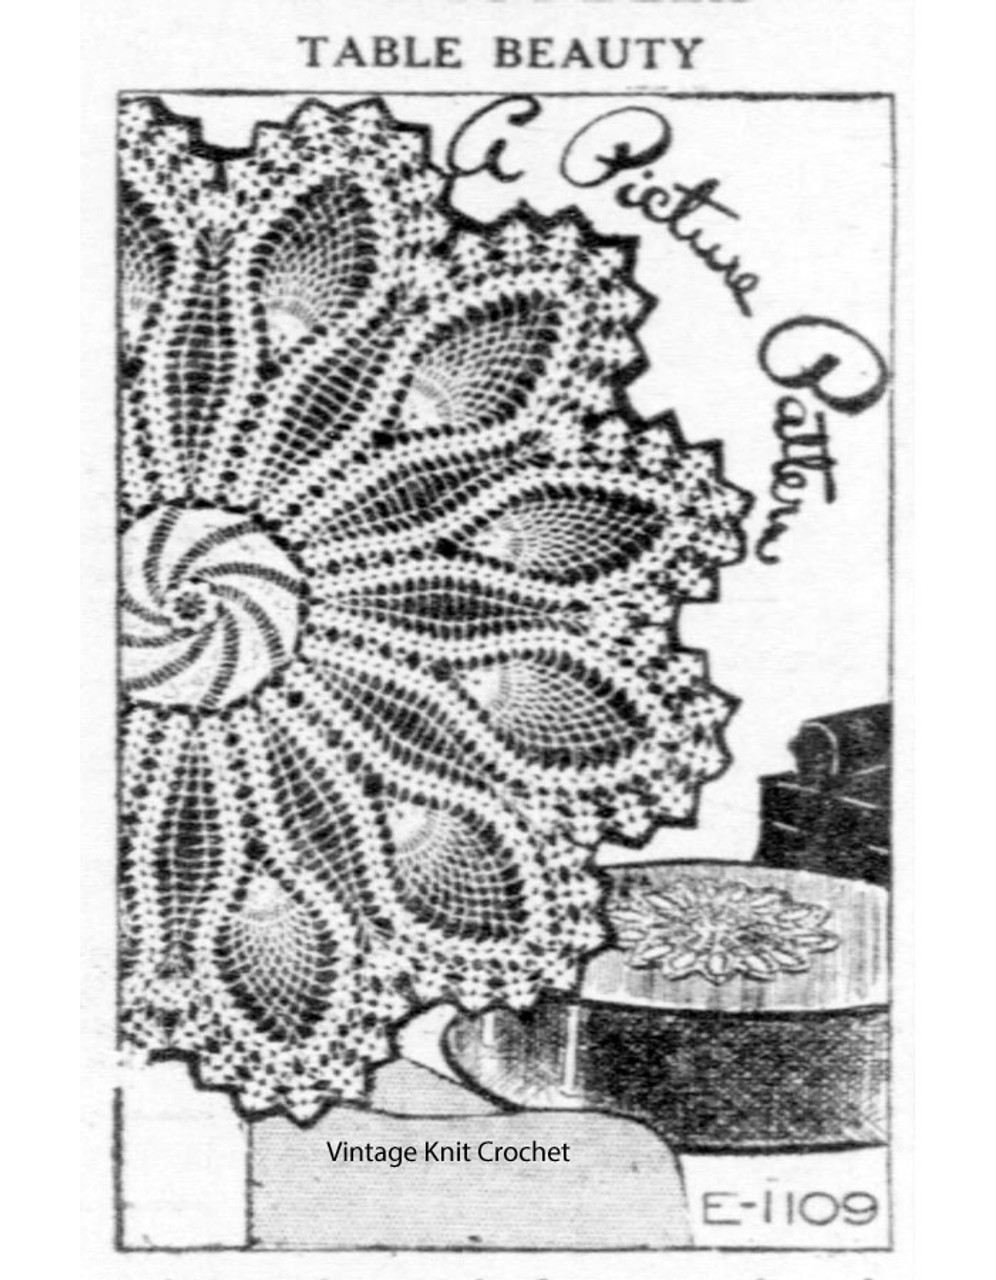 Crochet Pinwheel Doily Pattern in Pineapple No E-1109